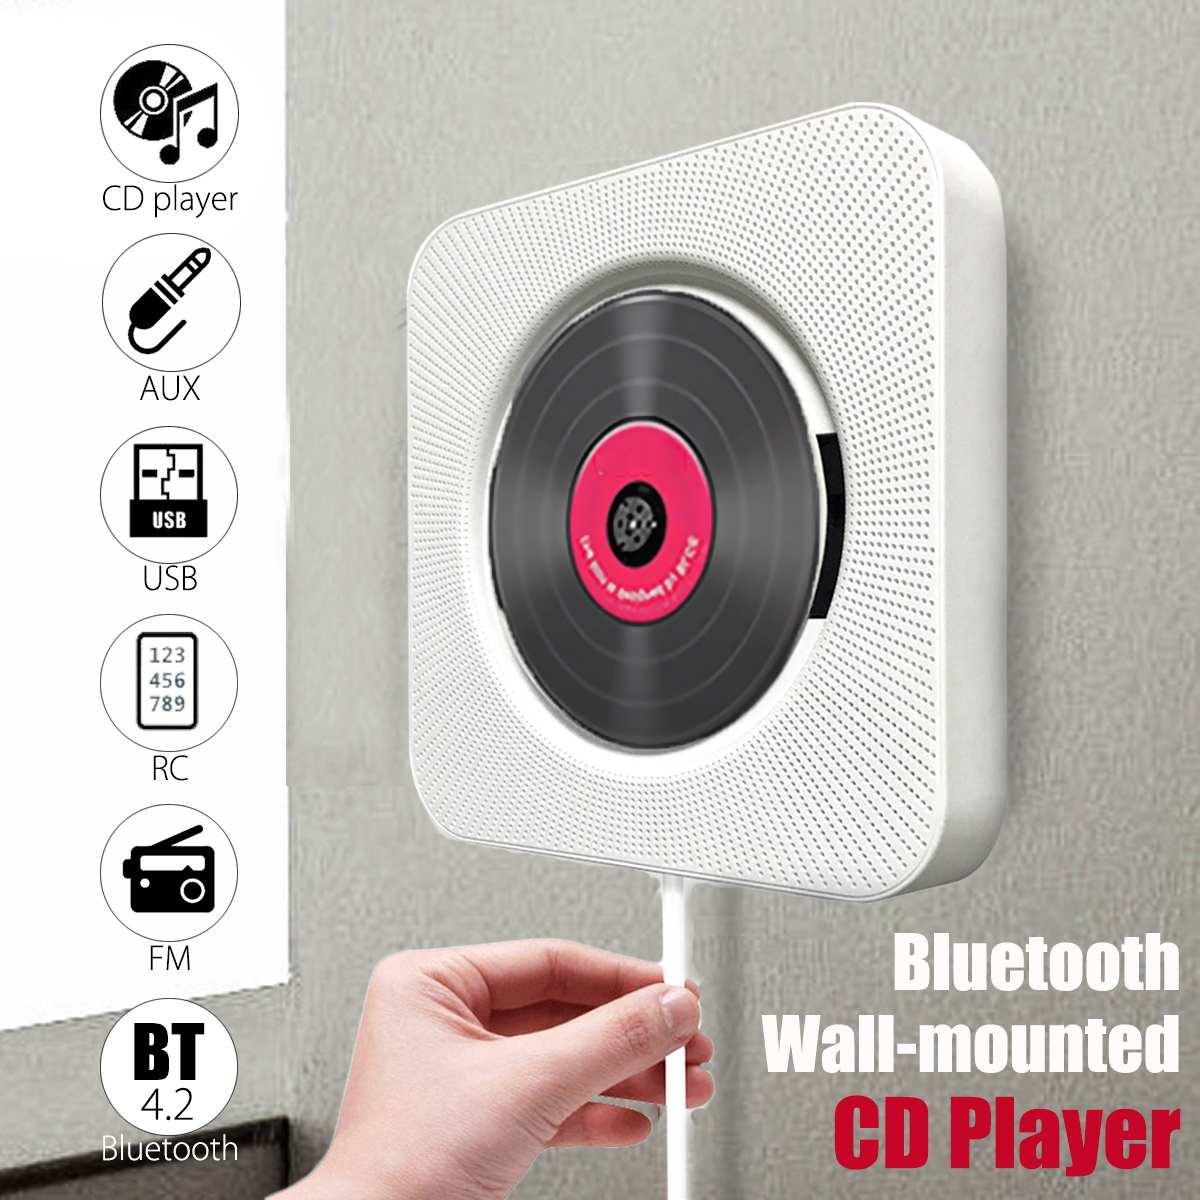 KINCO Portable Wall Mountable CD Player bluetooth Speaker Music Player Remote Control HiFi FM Radio USB MP3 Stereo